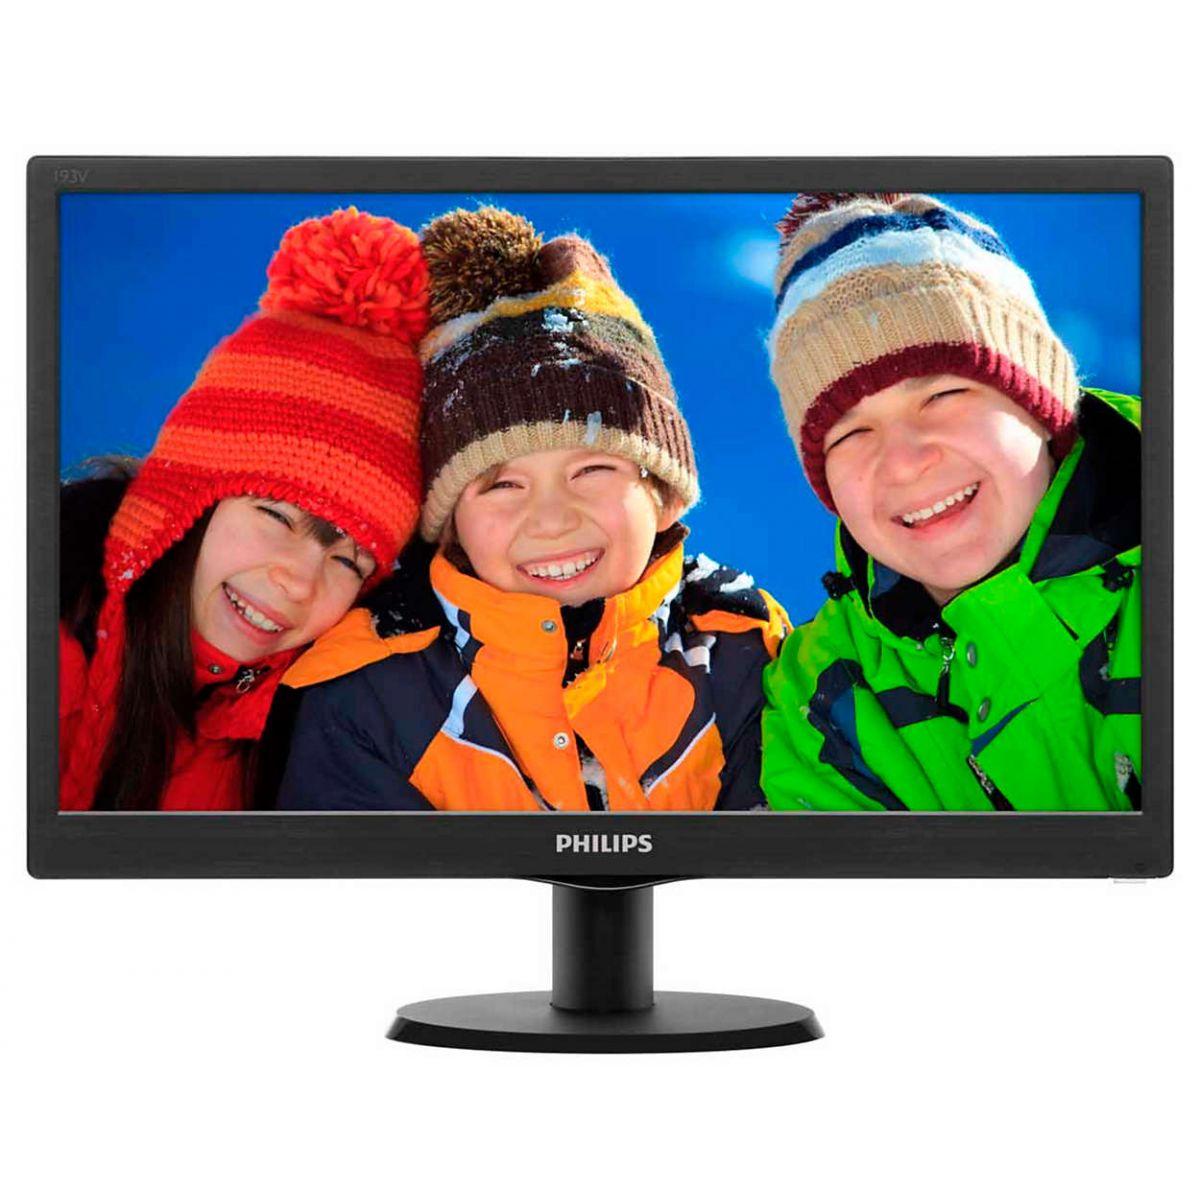 "Monitor Philips 18,5"" HDMI 193V5LHSB2 1366x768@60Hz  - Mega Computadores"